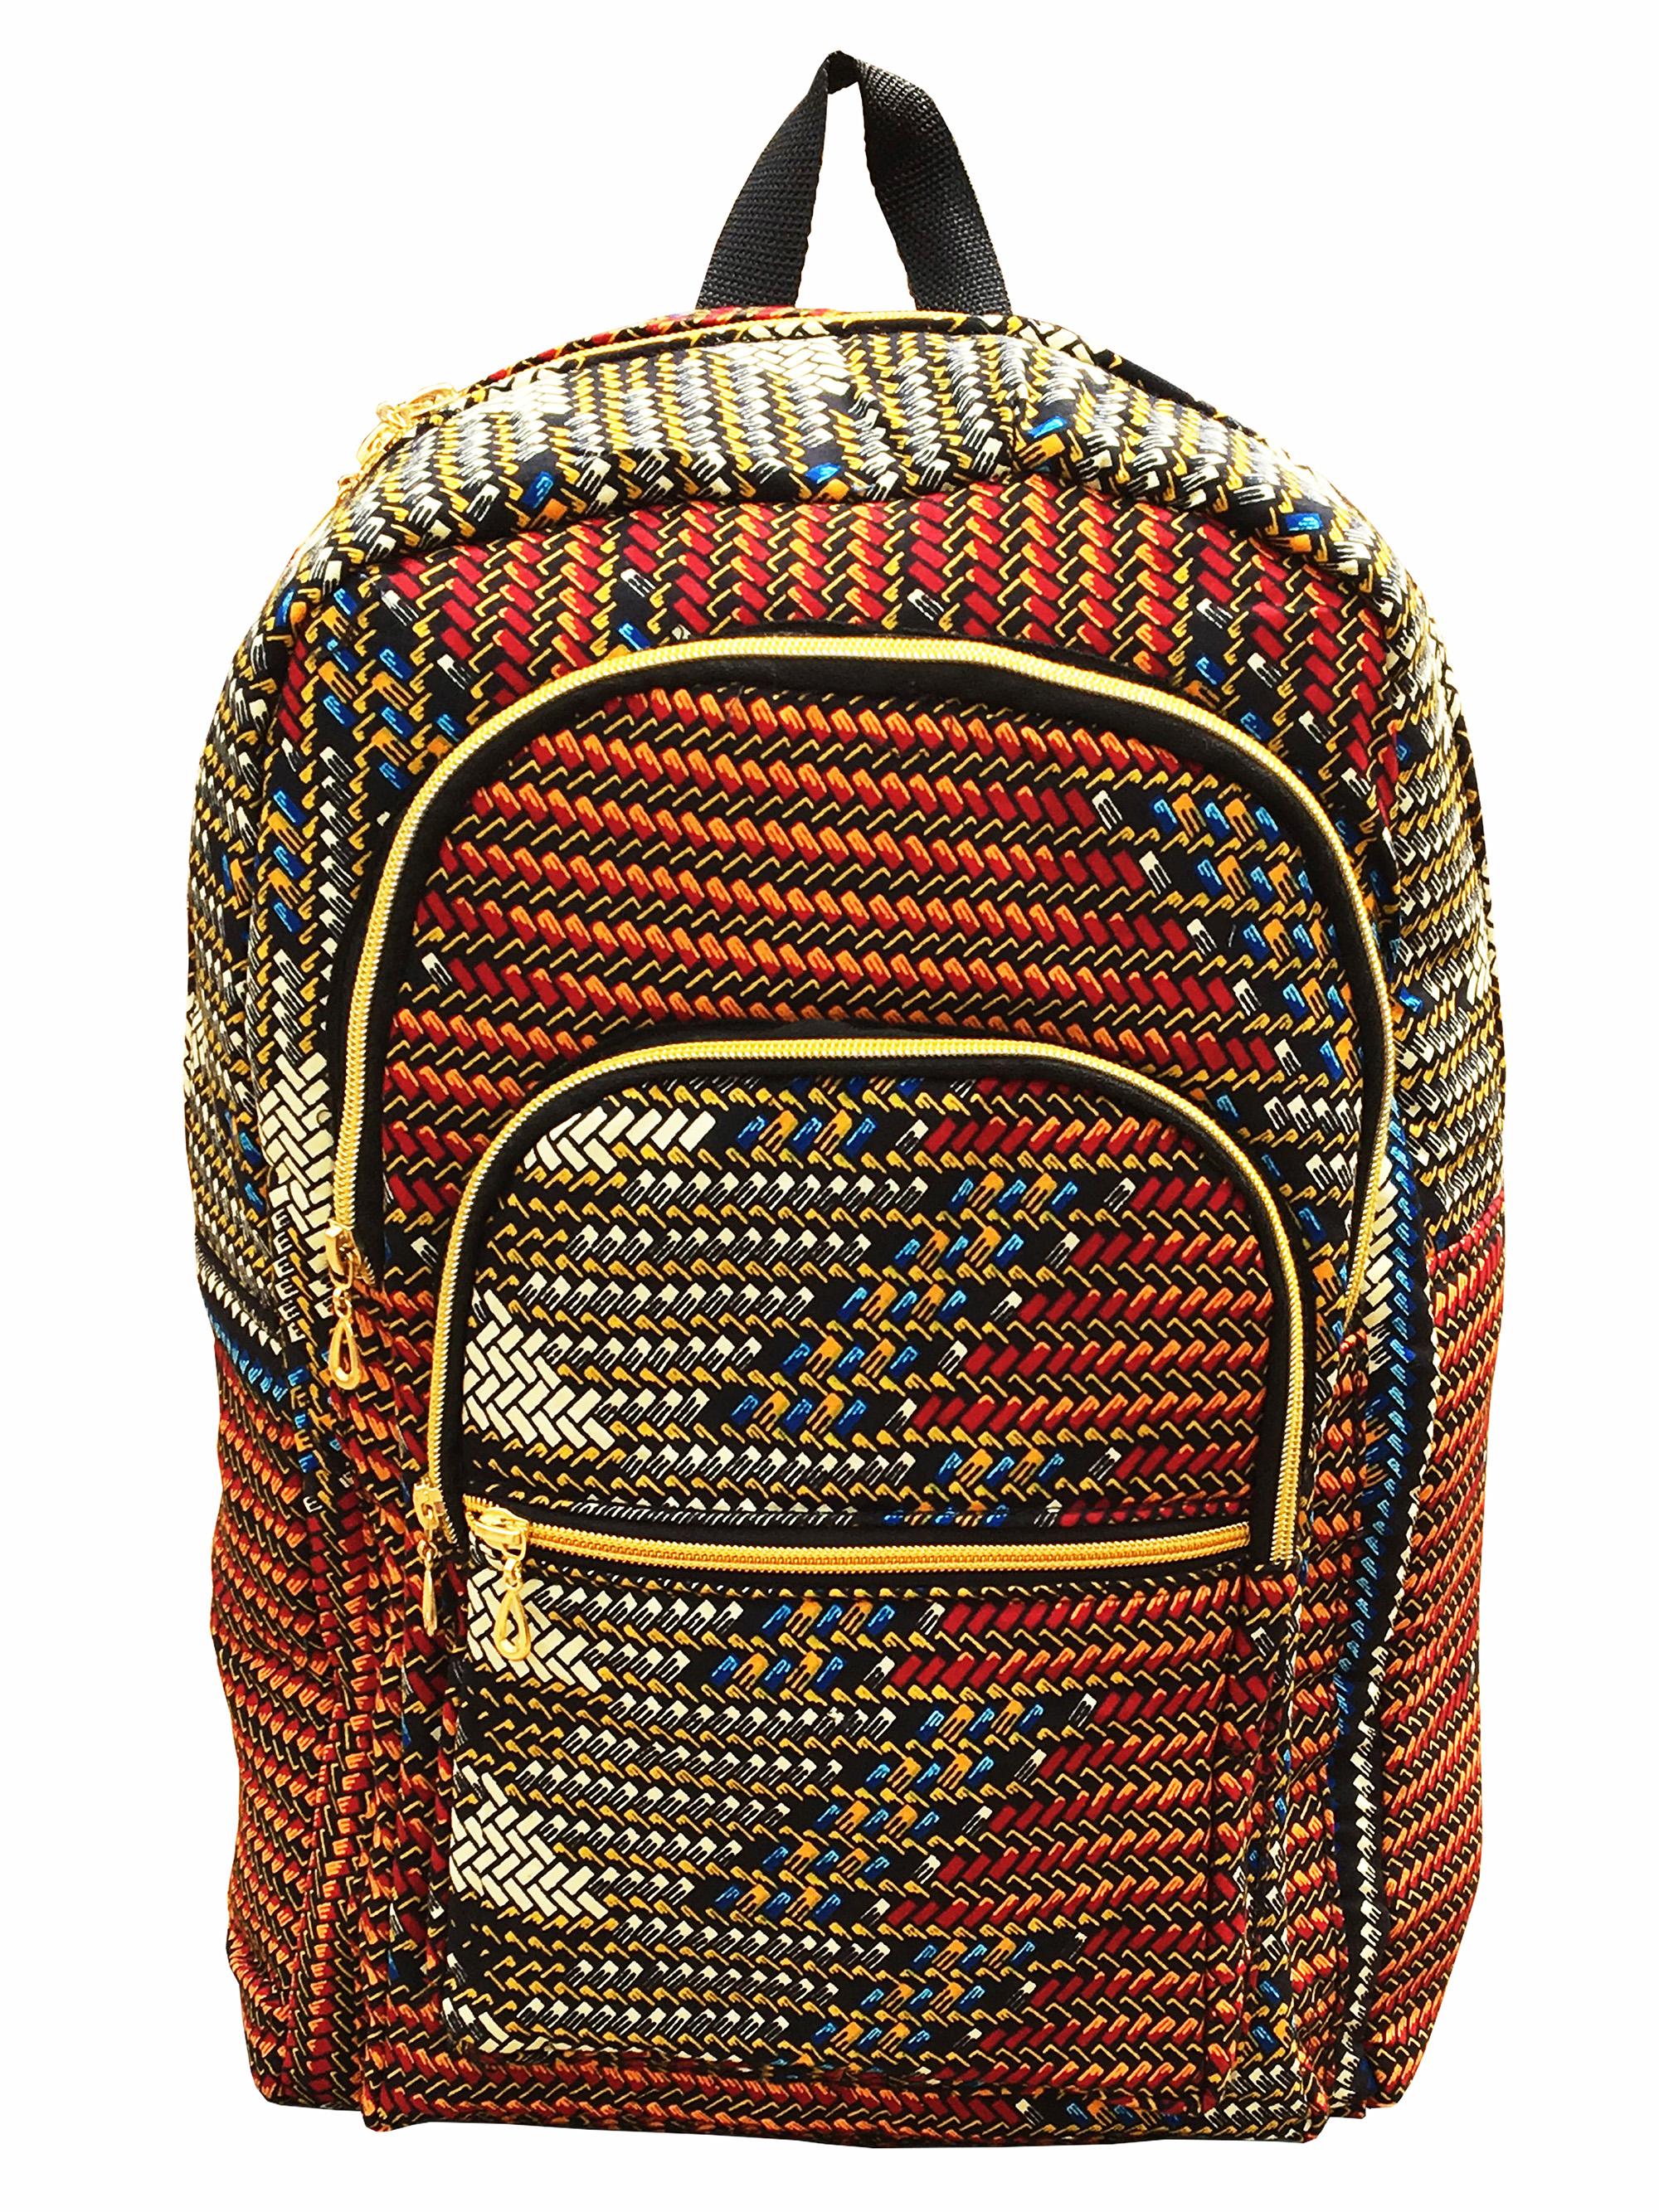 Ankara Wax African Print Book Bag Rucksack Handmade ...